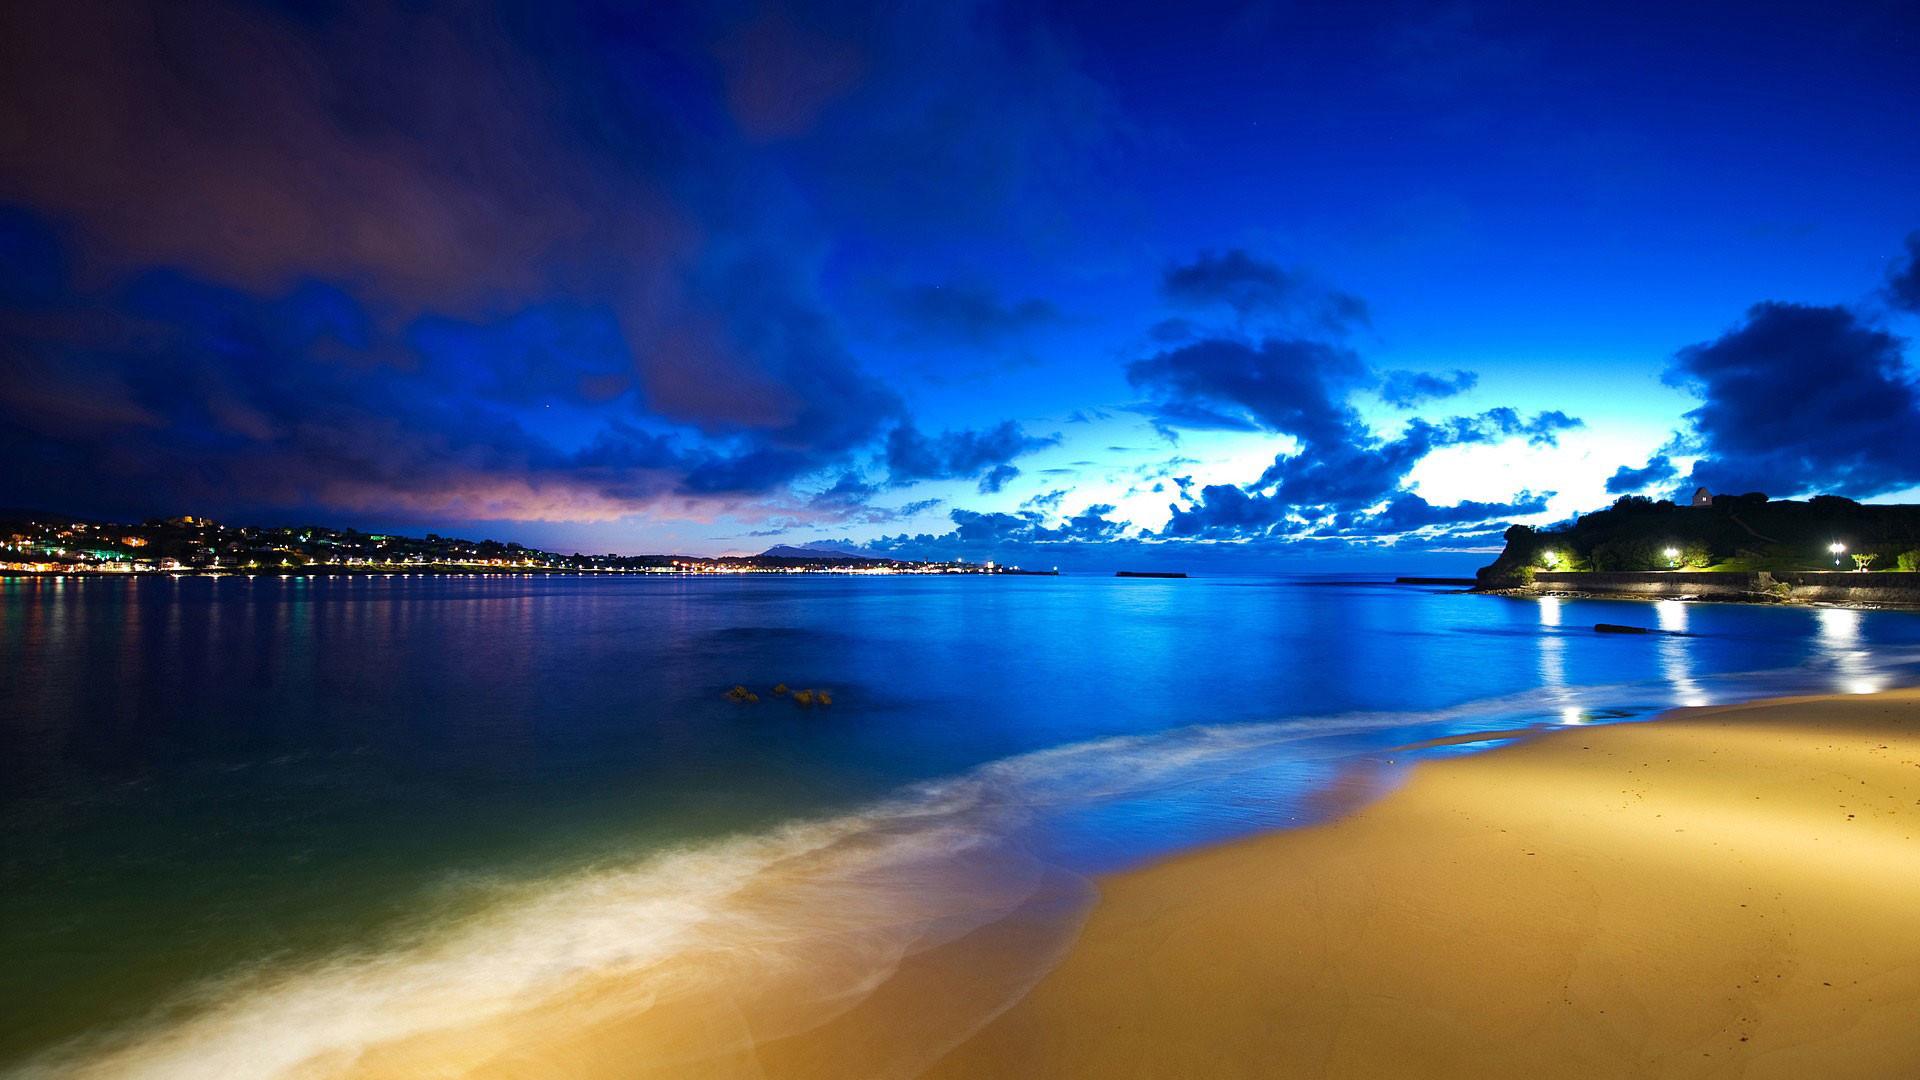 hd pics photos attractive beach blue night sea city lights stunning hd  quality desktop background wallpaper